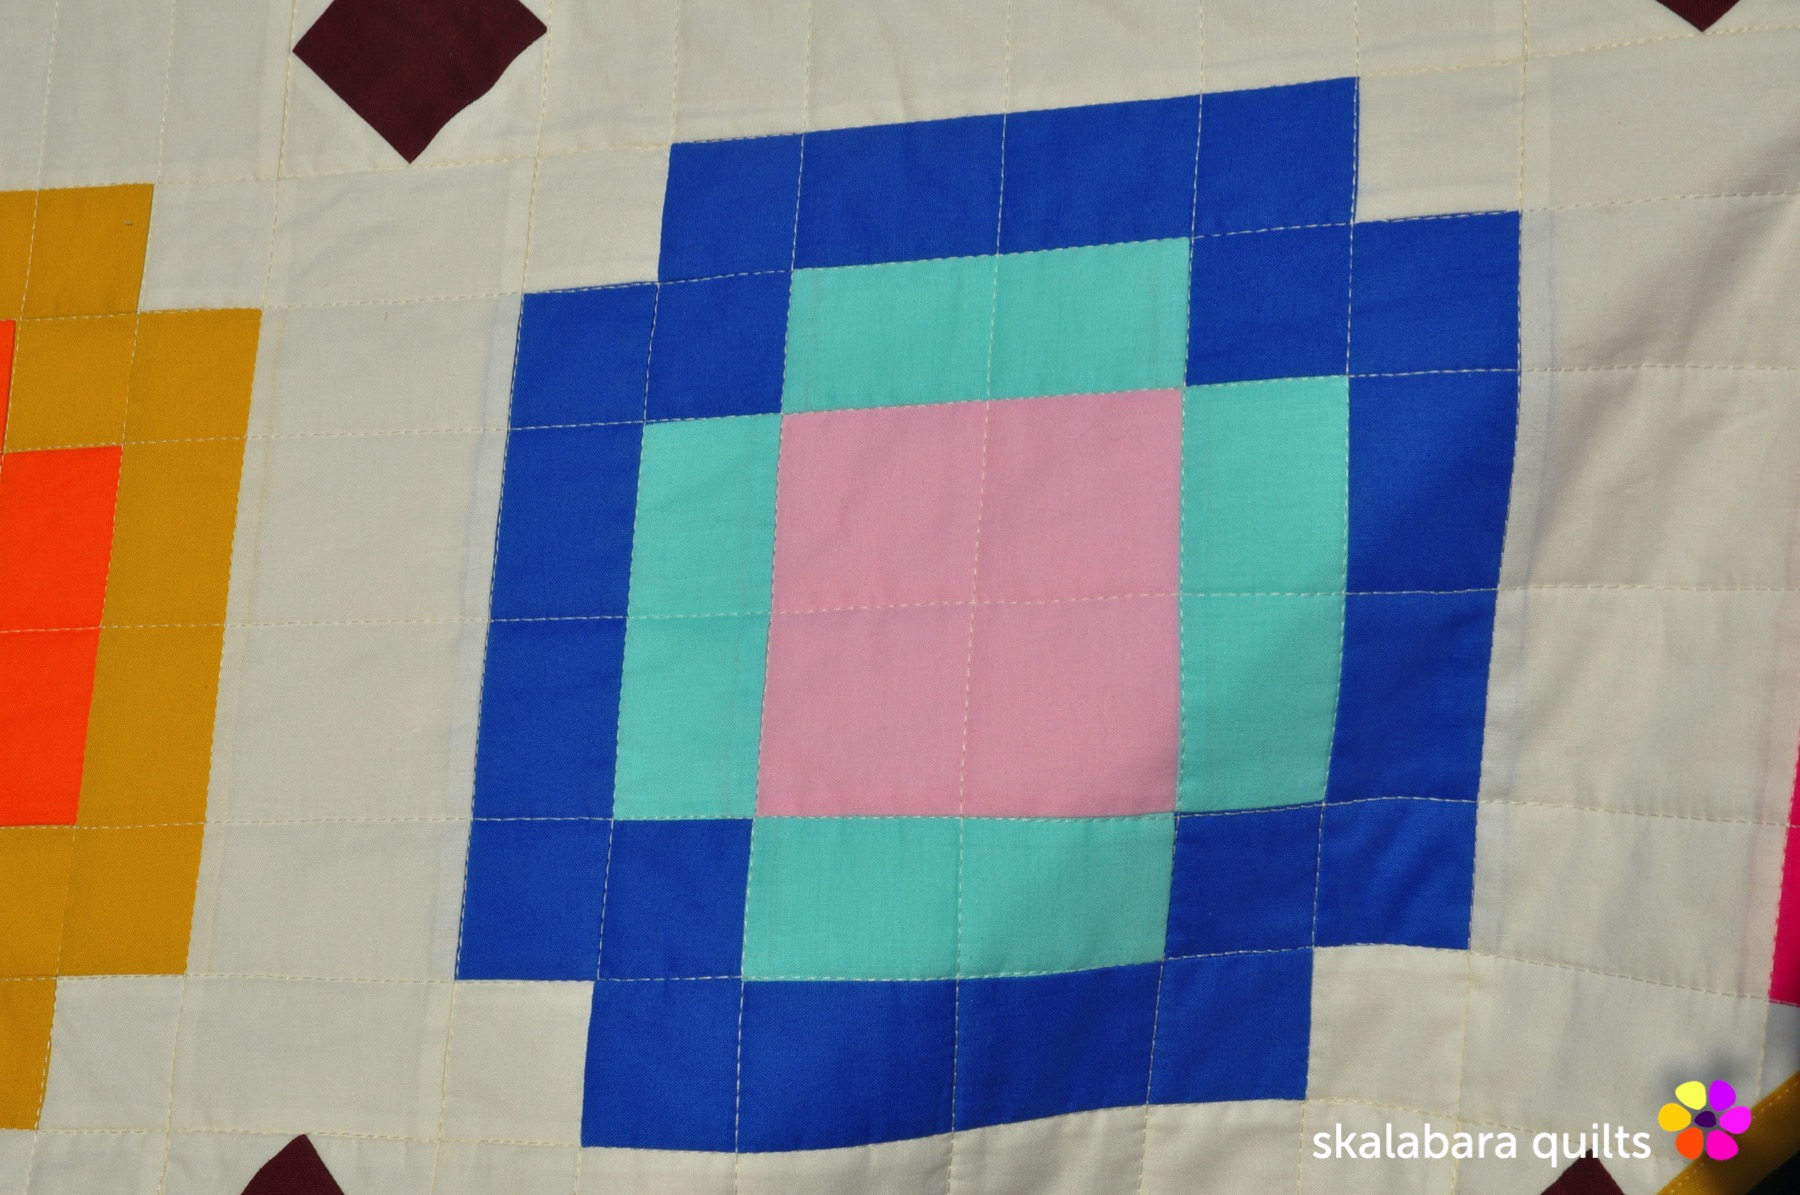 radiate quilt detail 1 - skalabara quilts